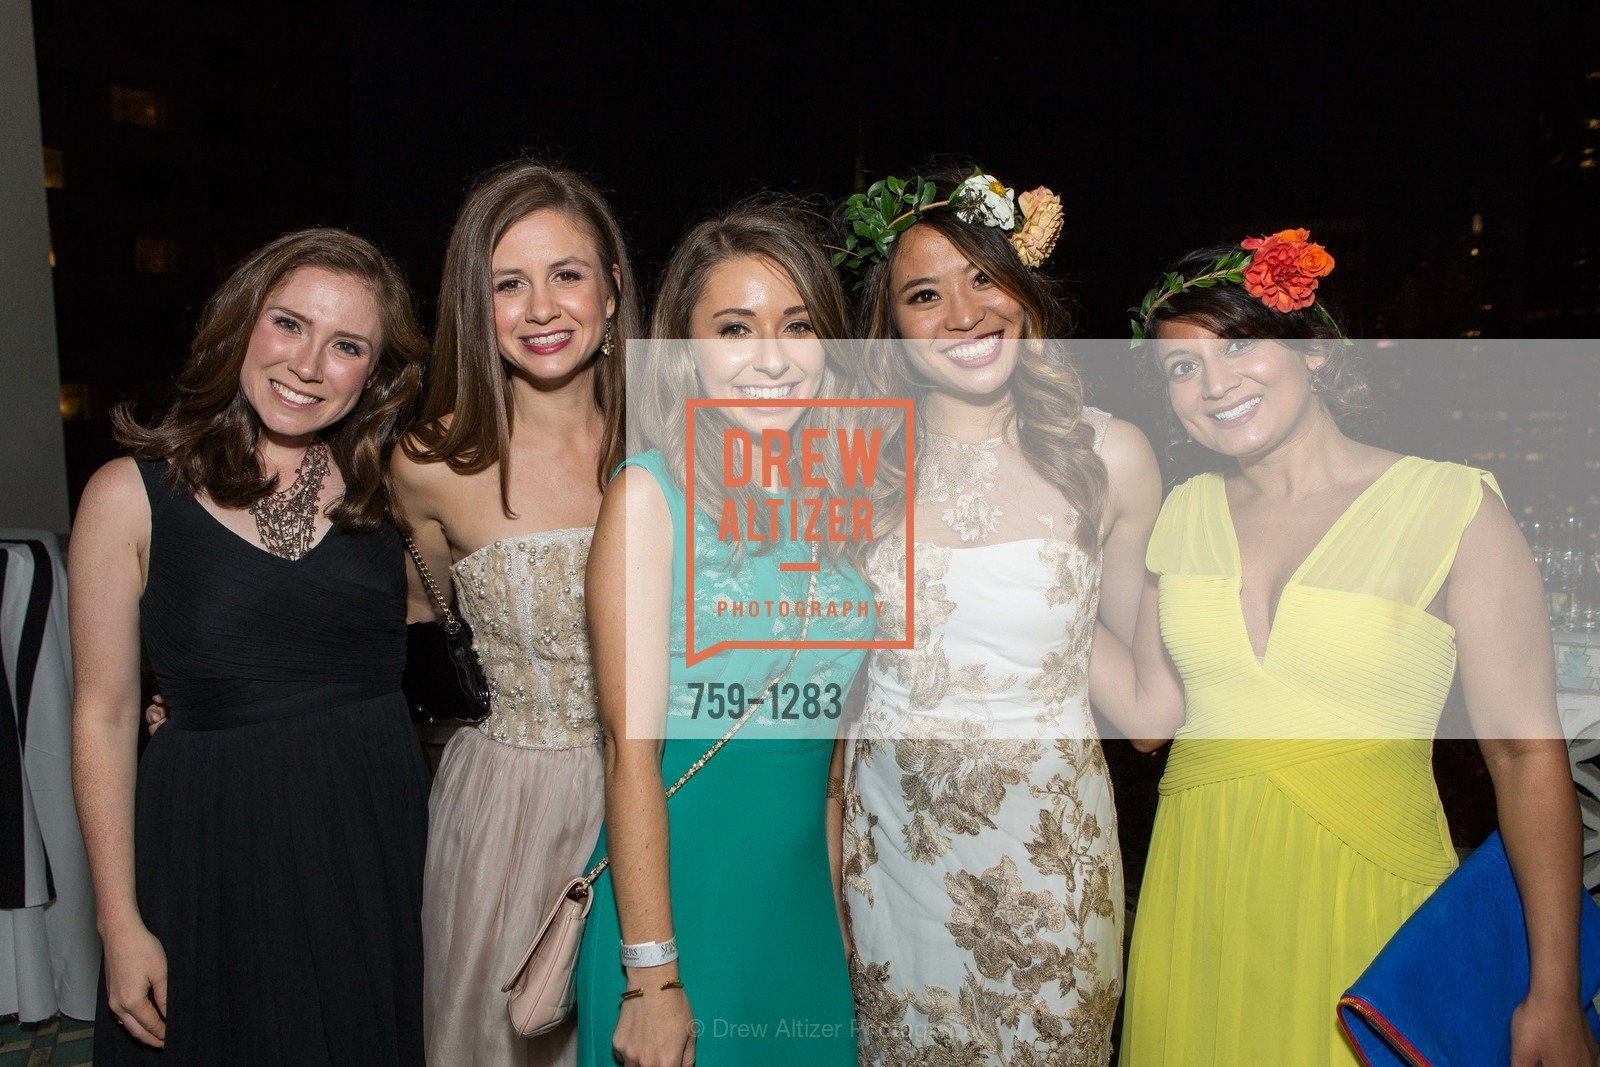 Mara Giarratana Young, Kristi Symon, Olga Levin, Rachel Tsao, Fatima Khan, Photo #759-1283